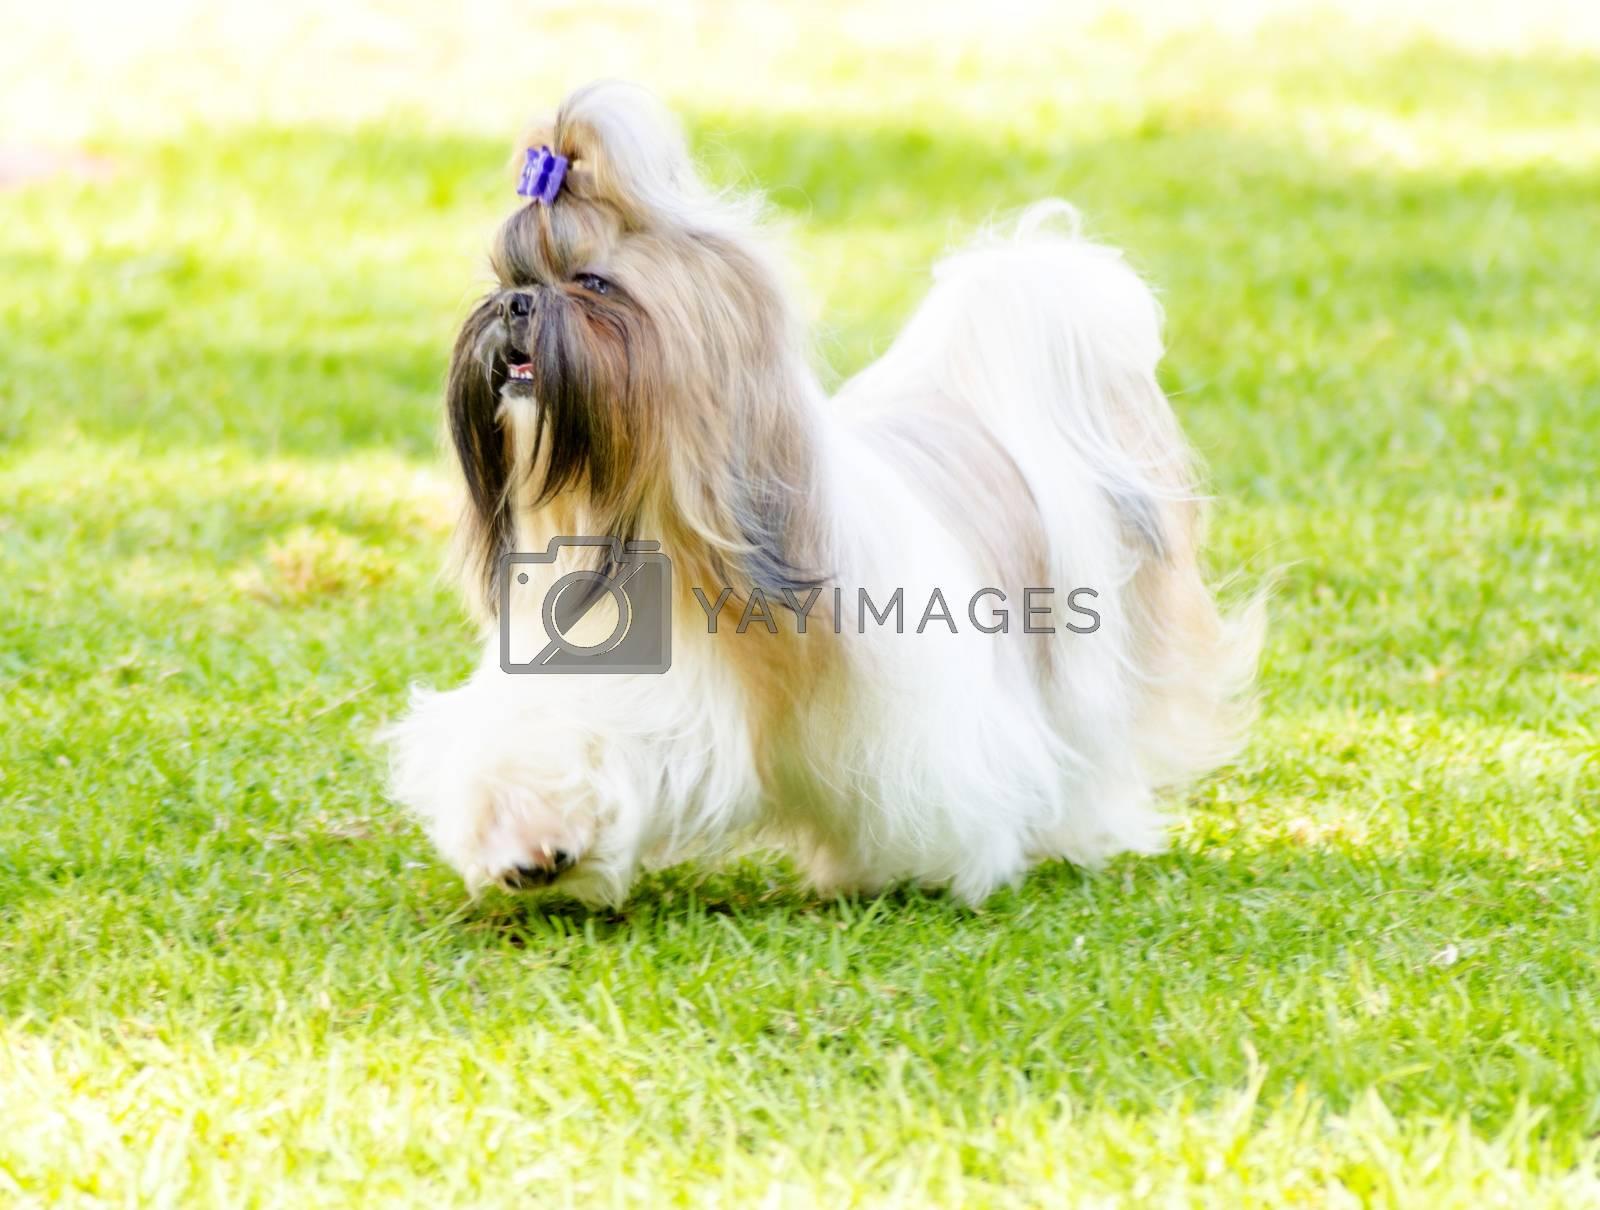 Shih Tzu dog by f8grapher